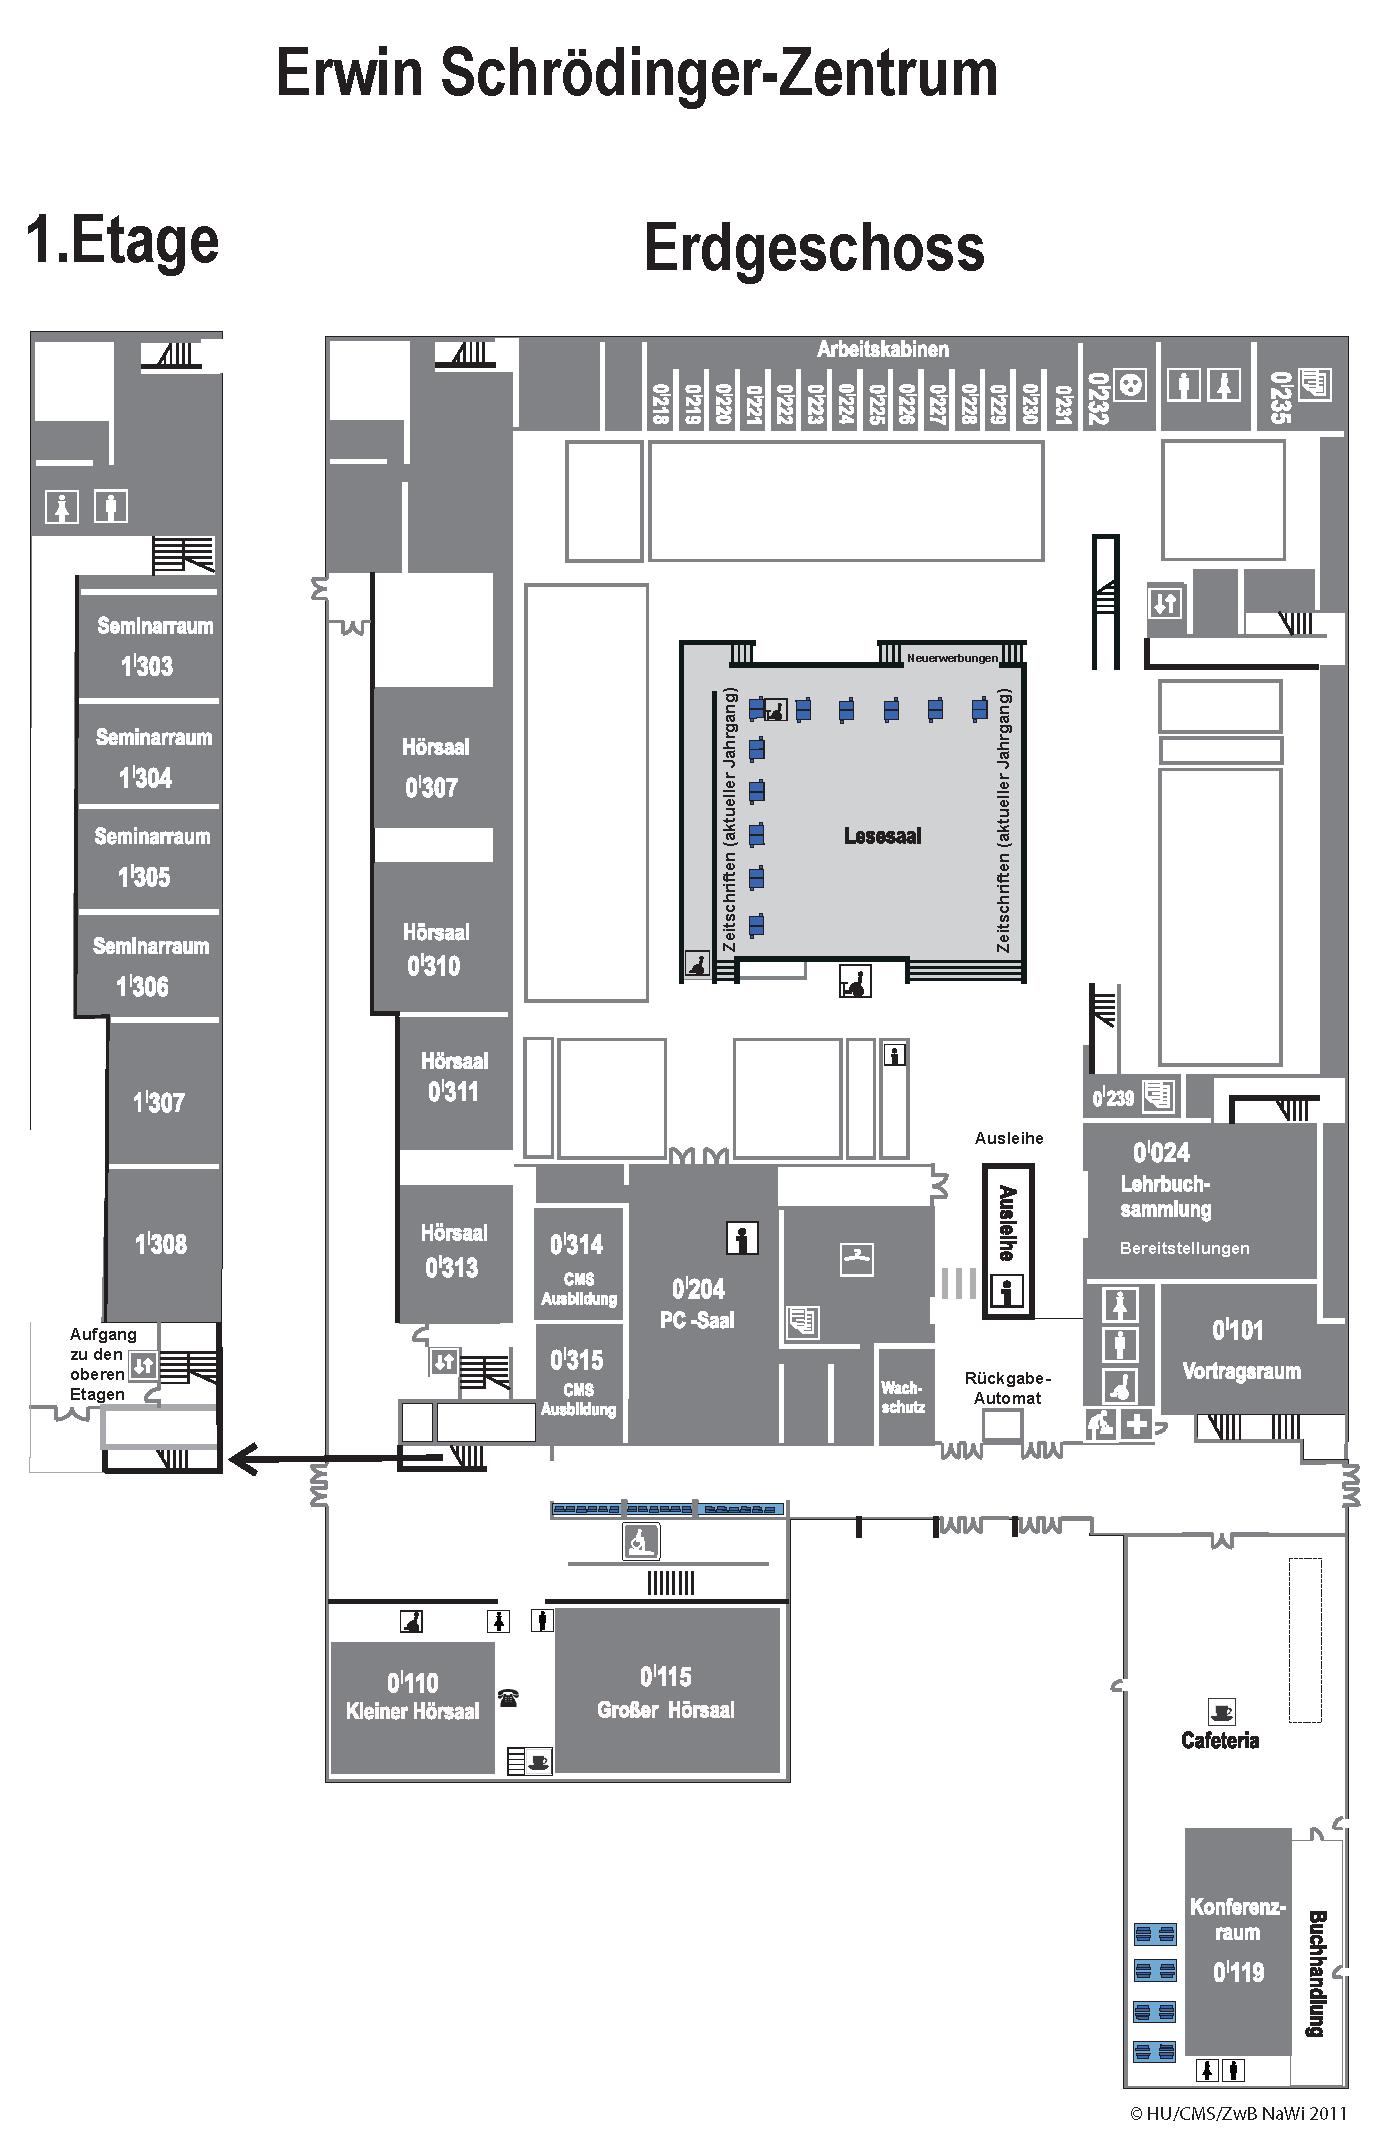 Erwin Diagram | Erwin Schrodinger Zentrum Gdcp 2015